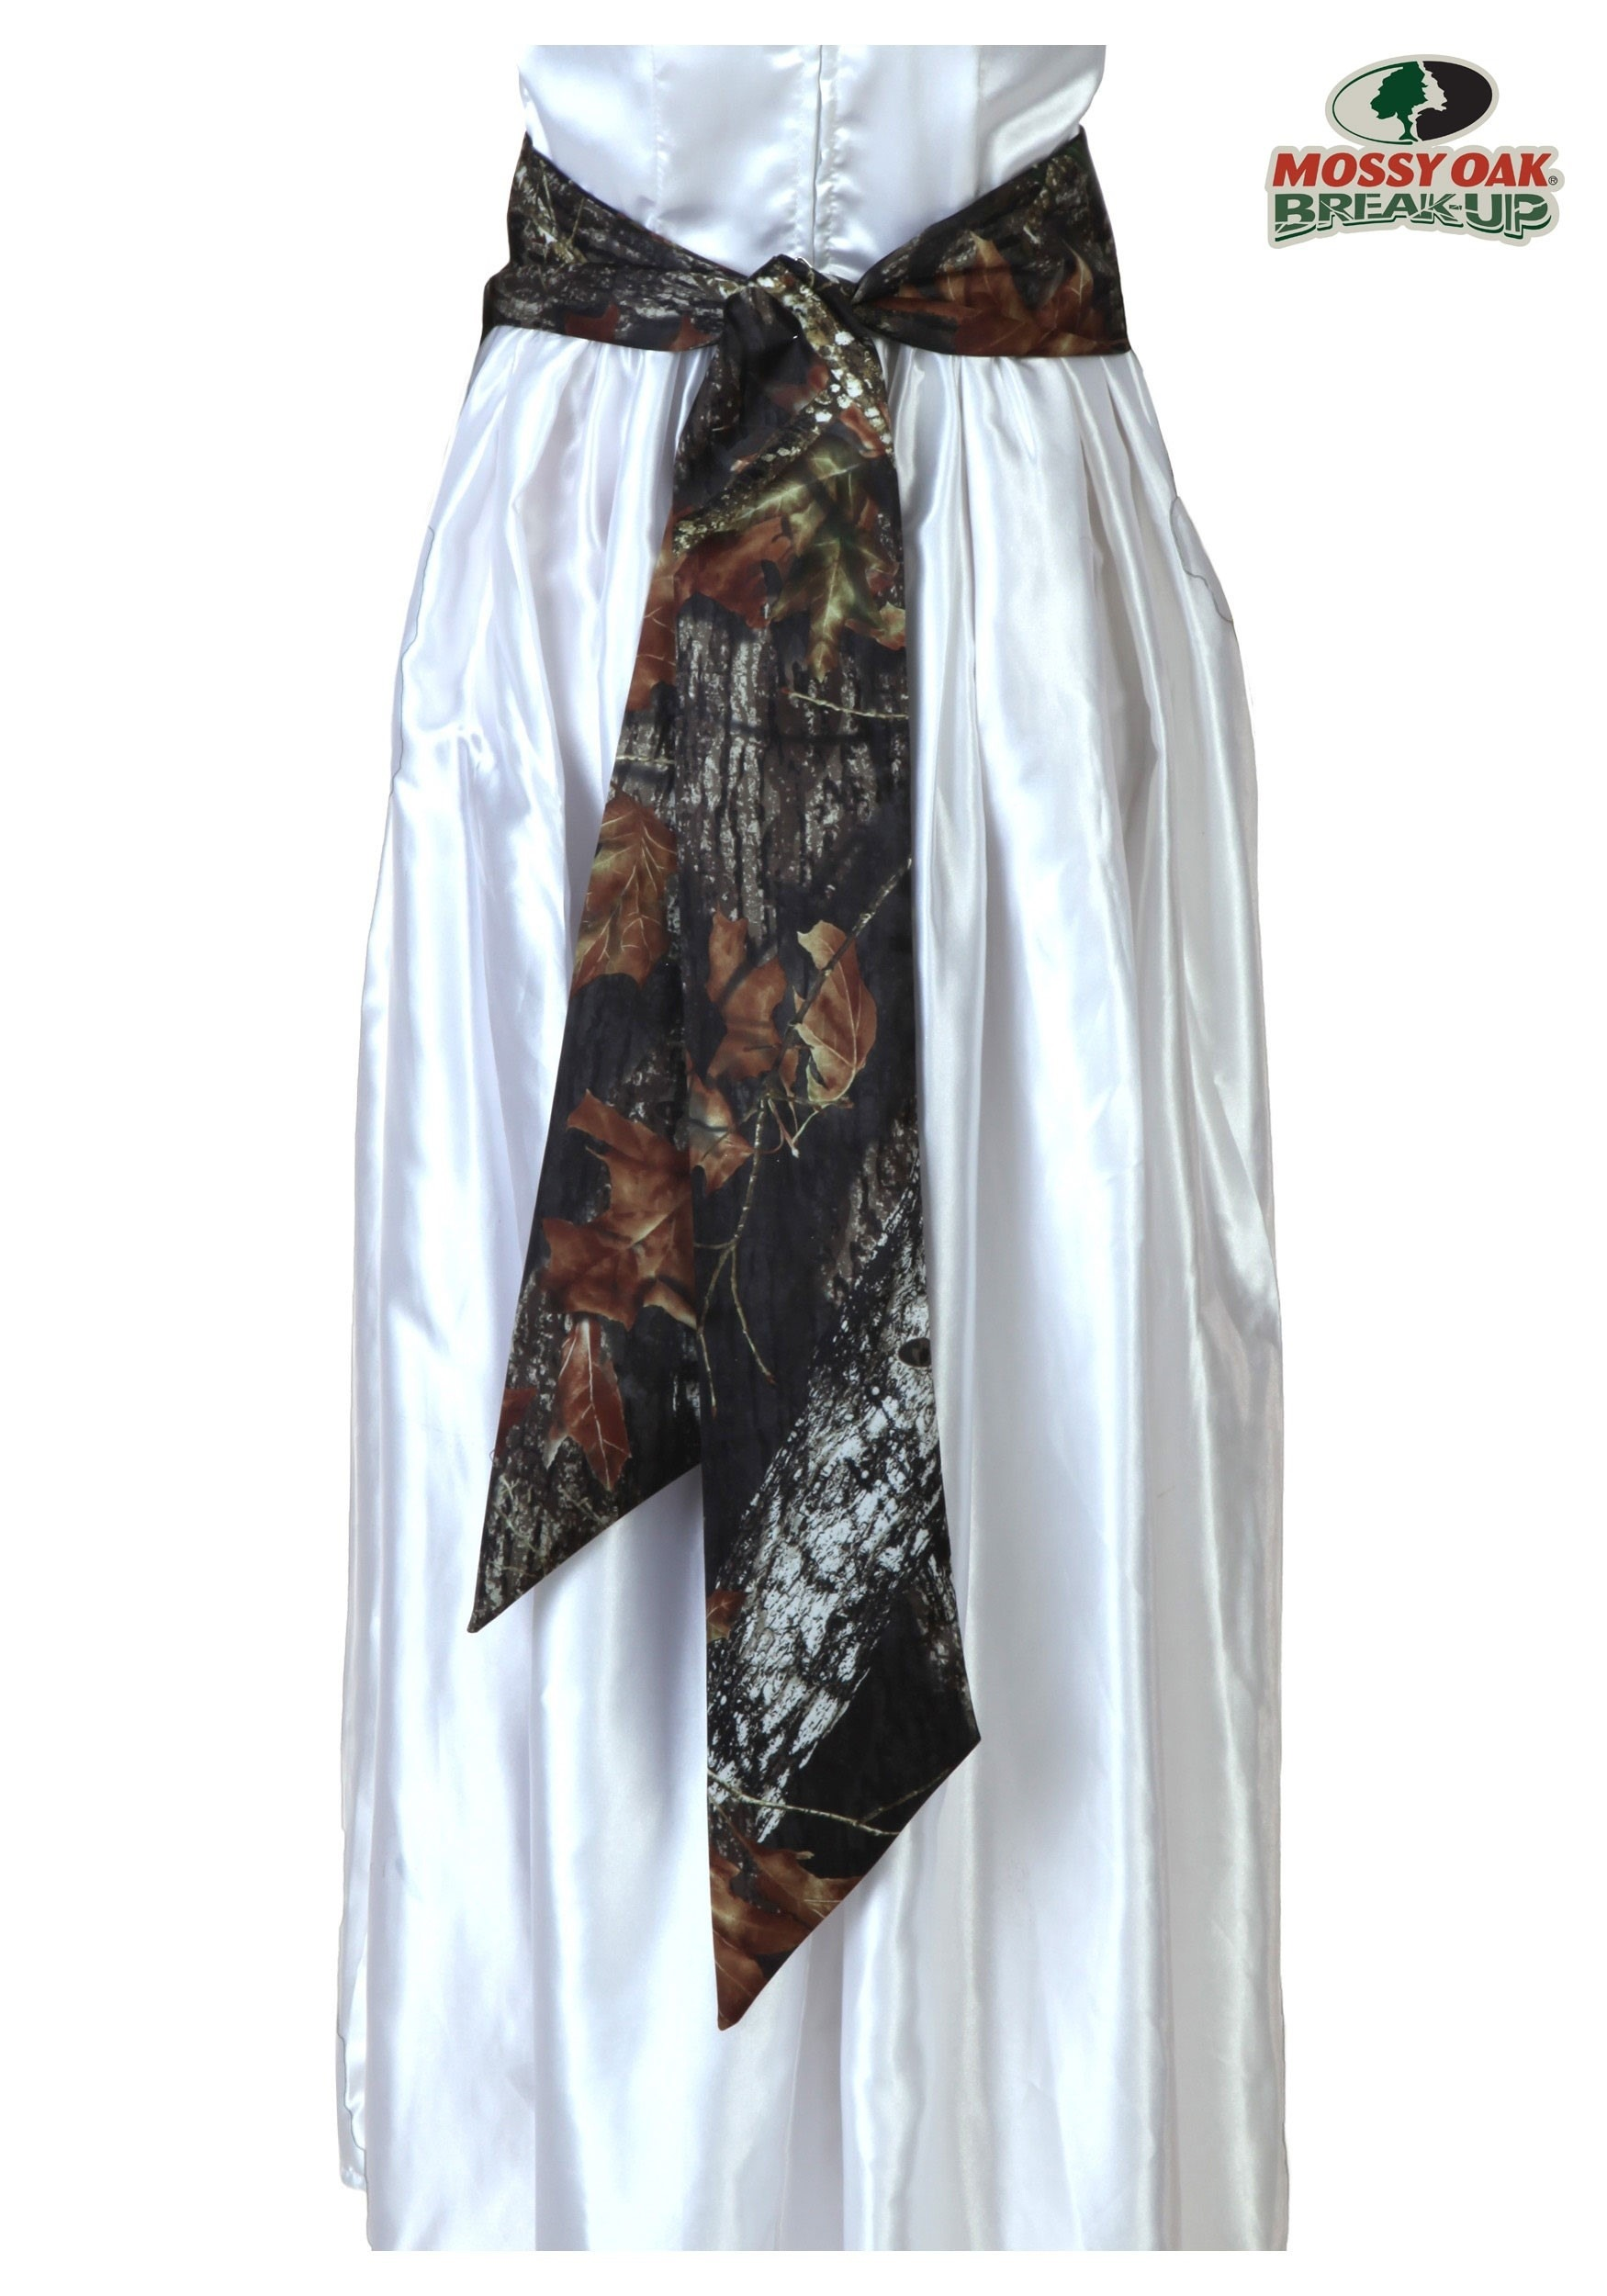 Mossy Oak Camo Bridal Sash